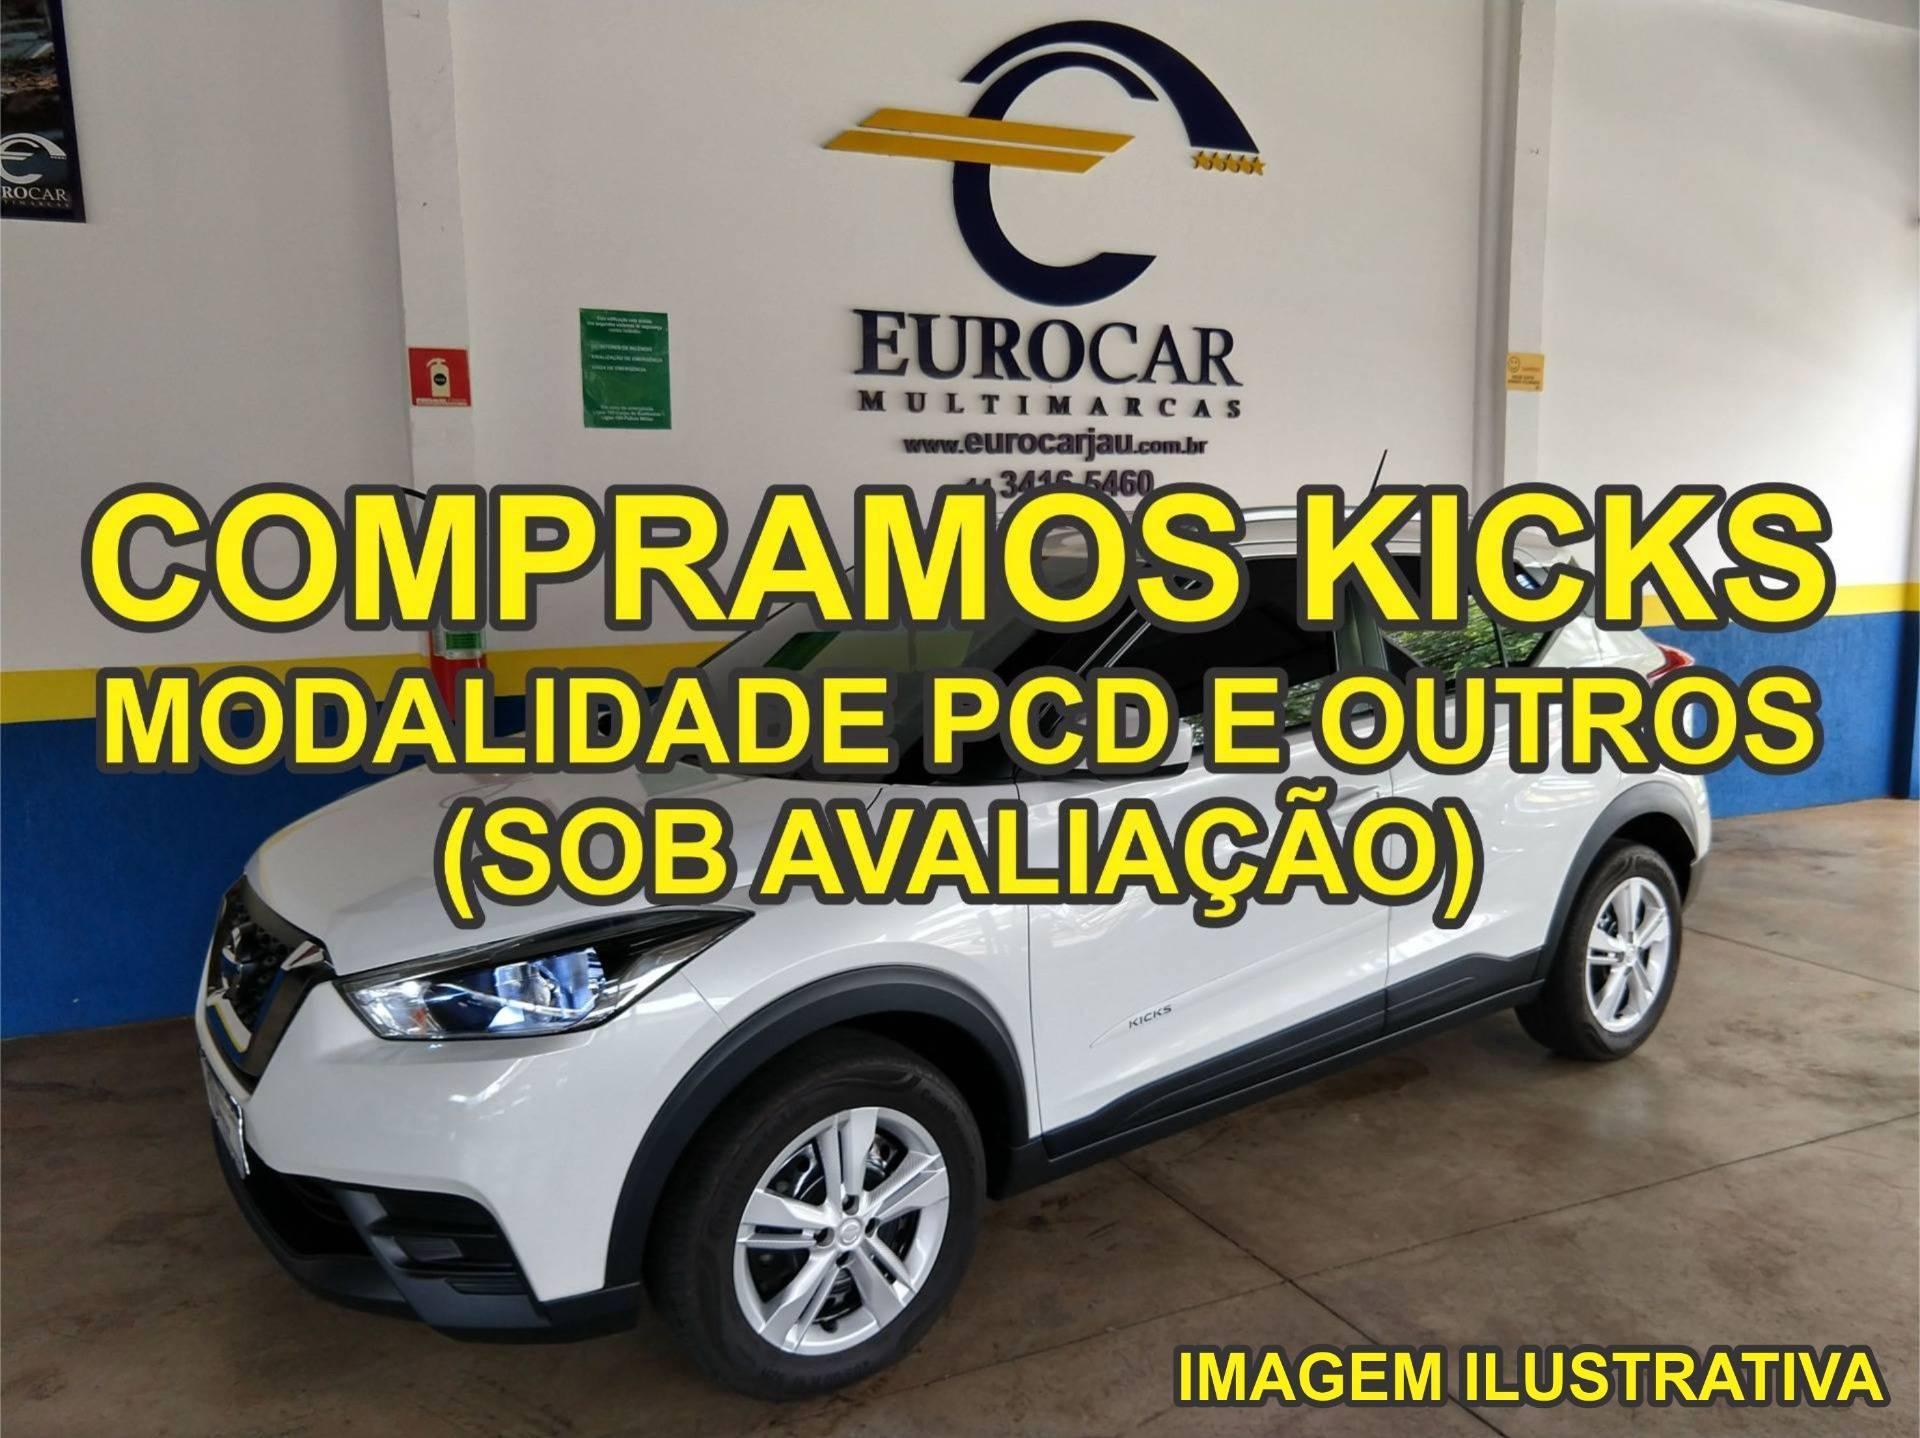 NISSAN Kicks 1.6 16V 4P FLEX S X-TRONIC AUTOMÁTICO CVT, Foto 1